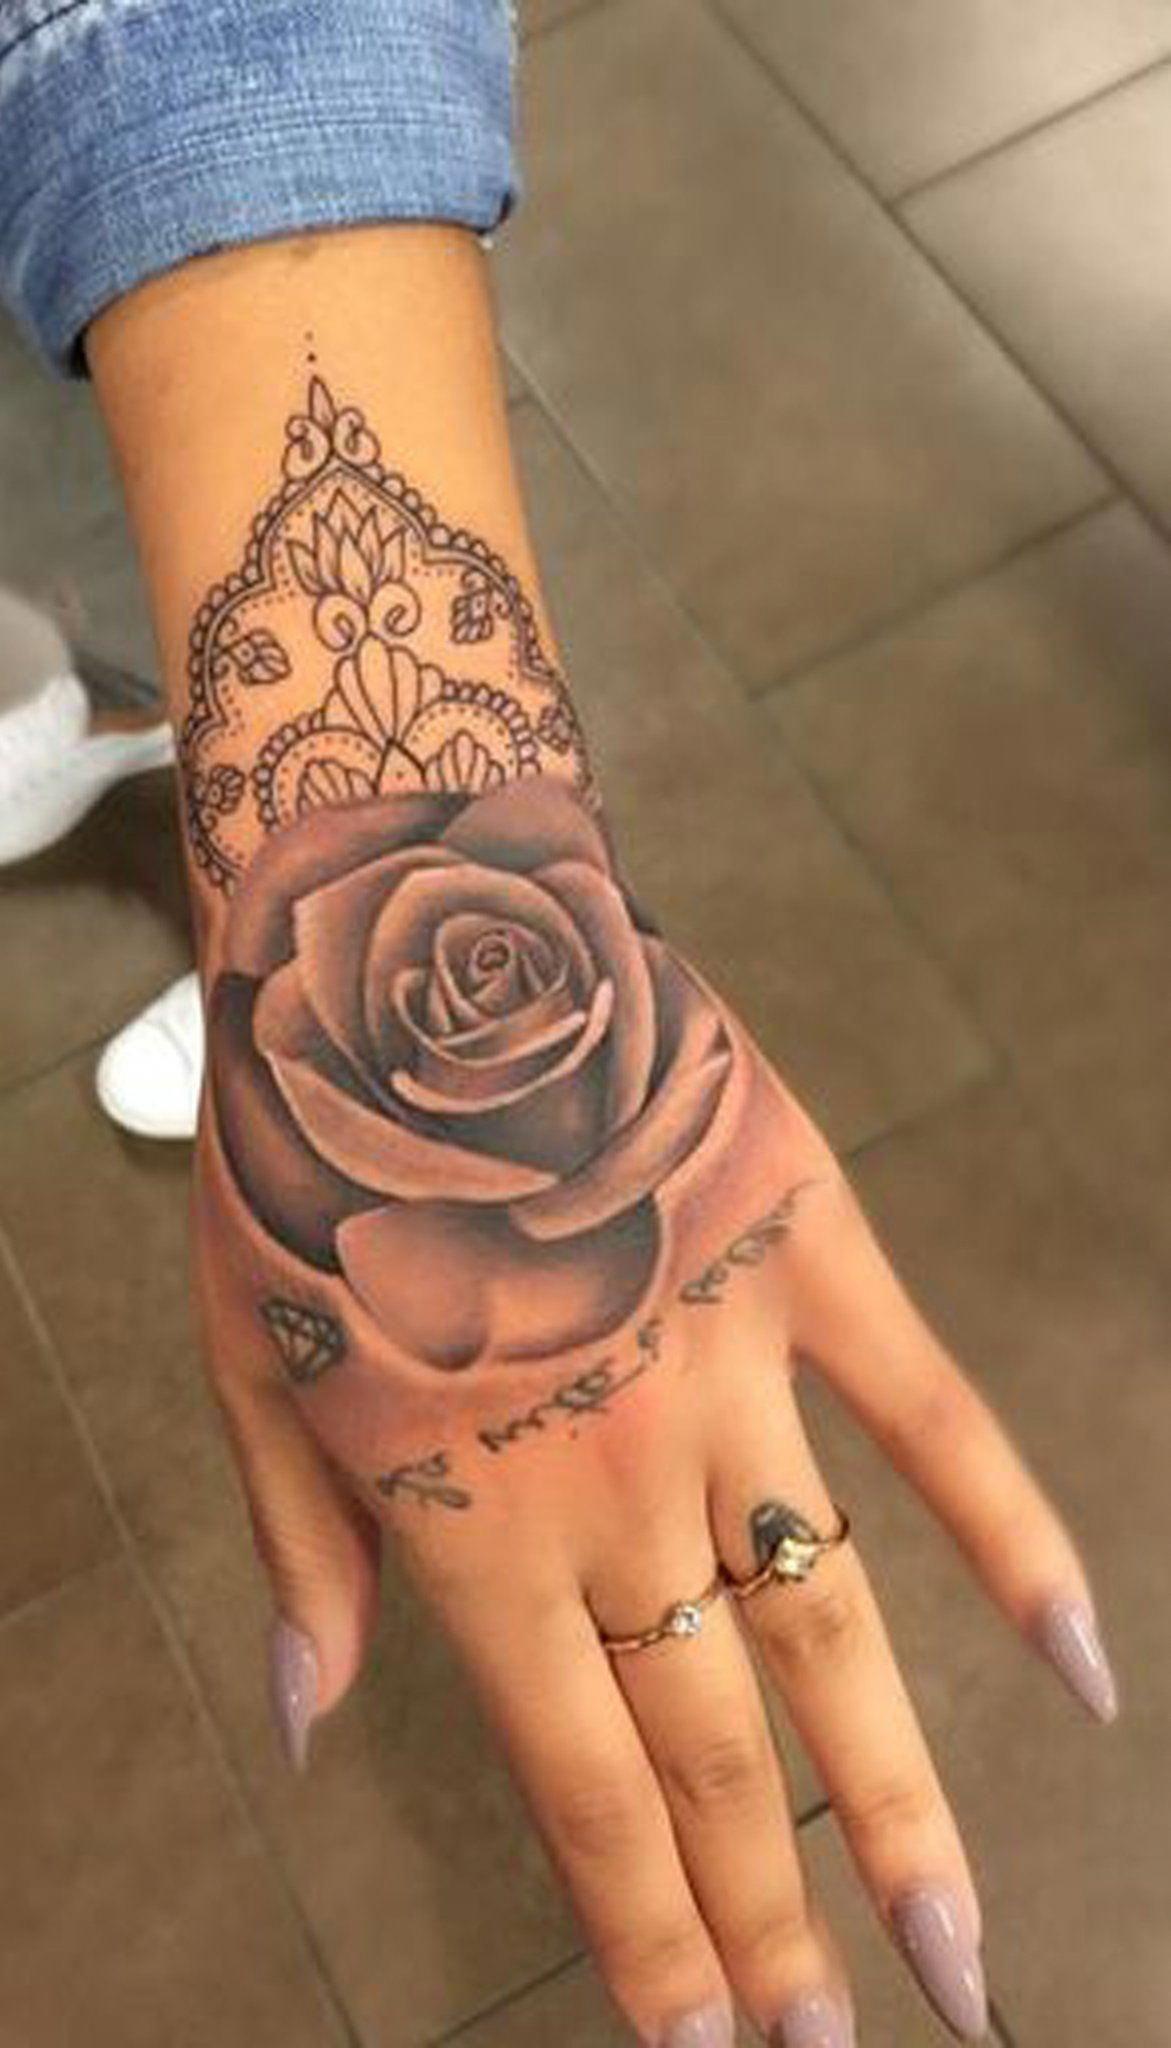 Geometric Rose Hand Tattoo Ideas For Women Unique Watercolor Mandala Tat Www Mybodiart Com Tattoos Geometrictattoos Rose Hand Tattoo Hand Tattoos Tattoos